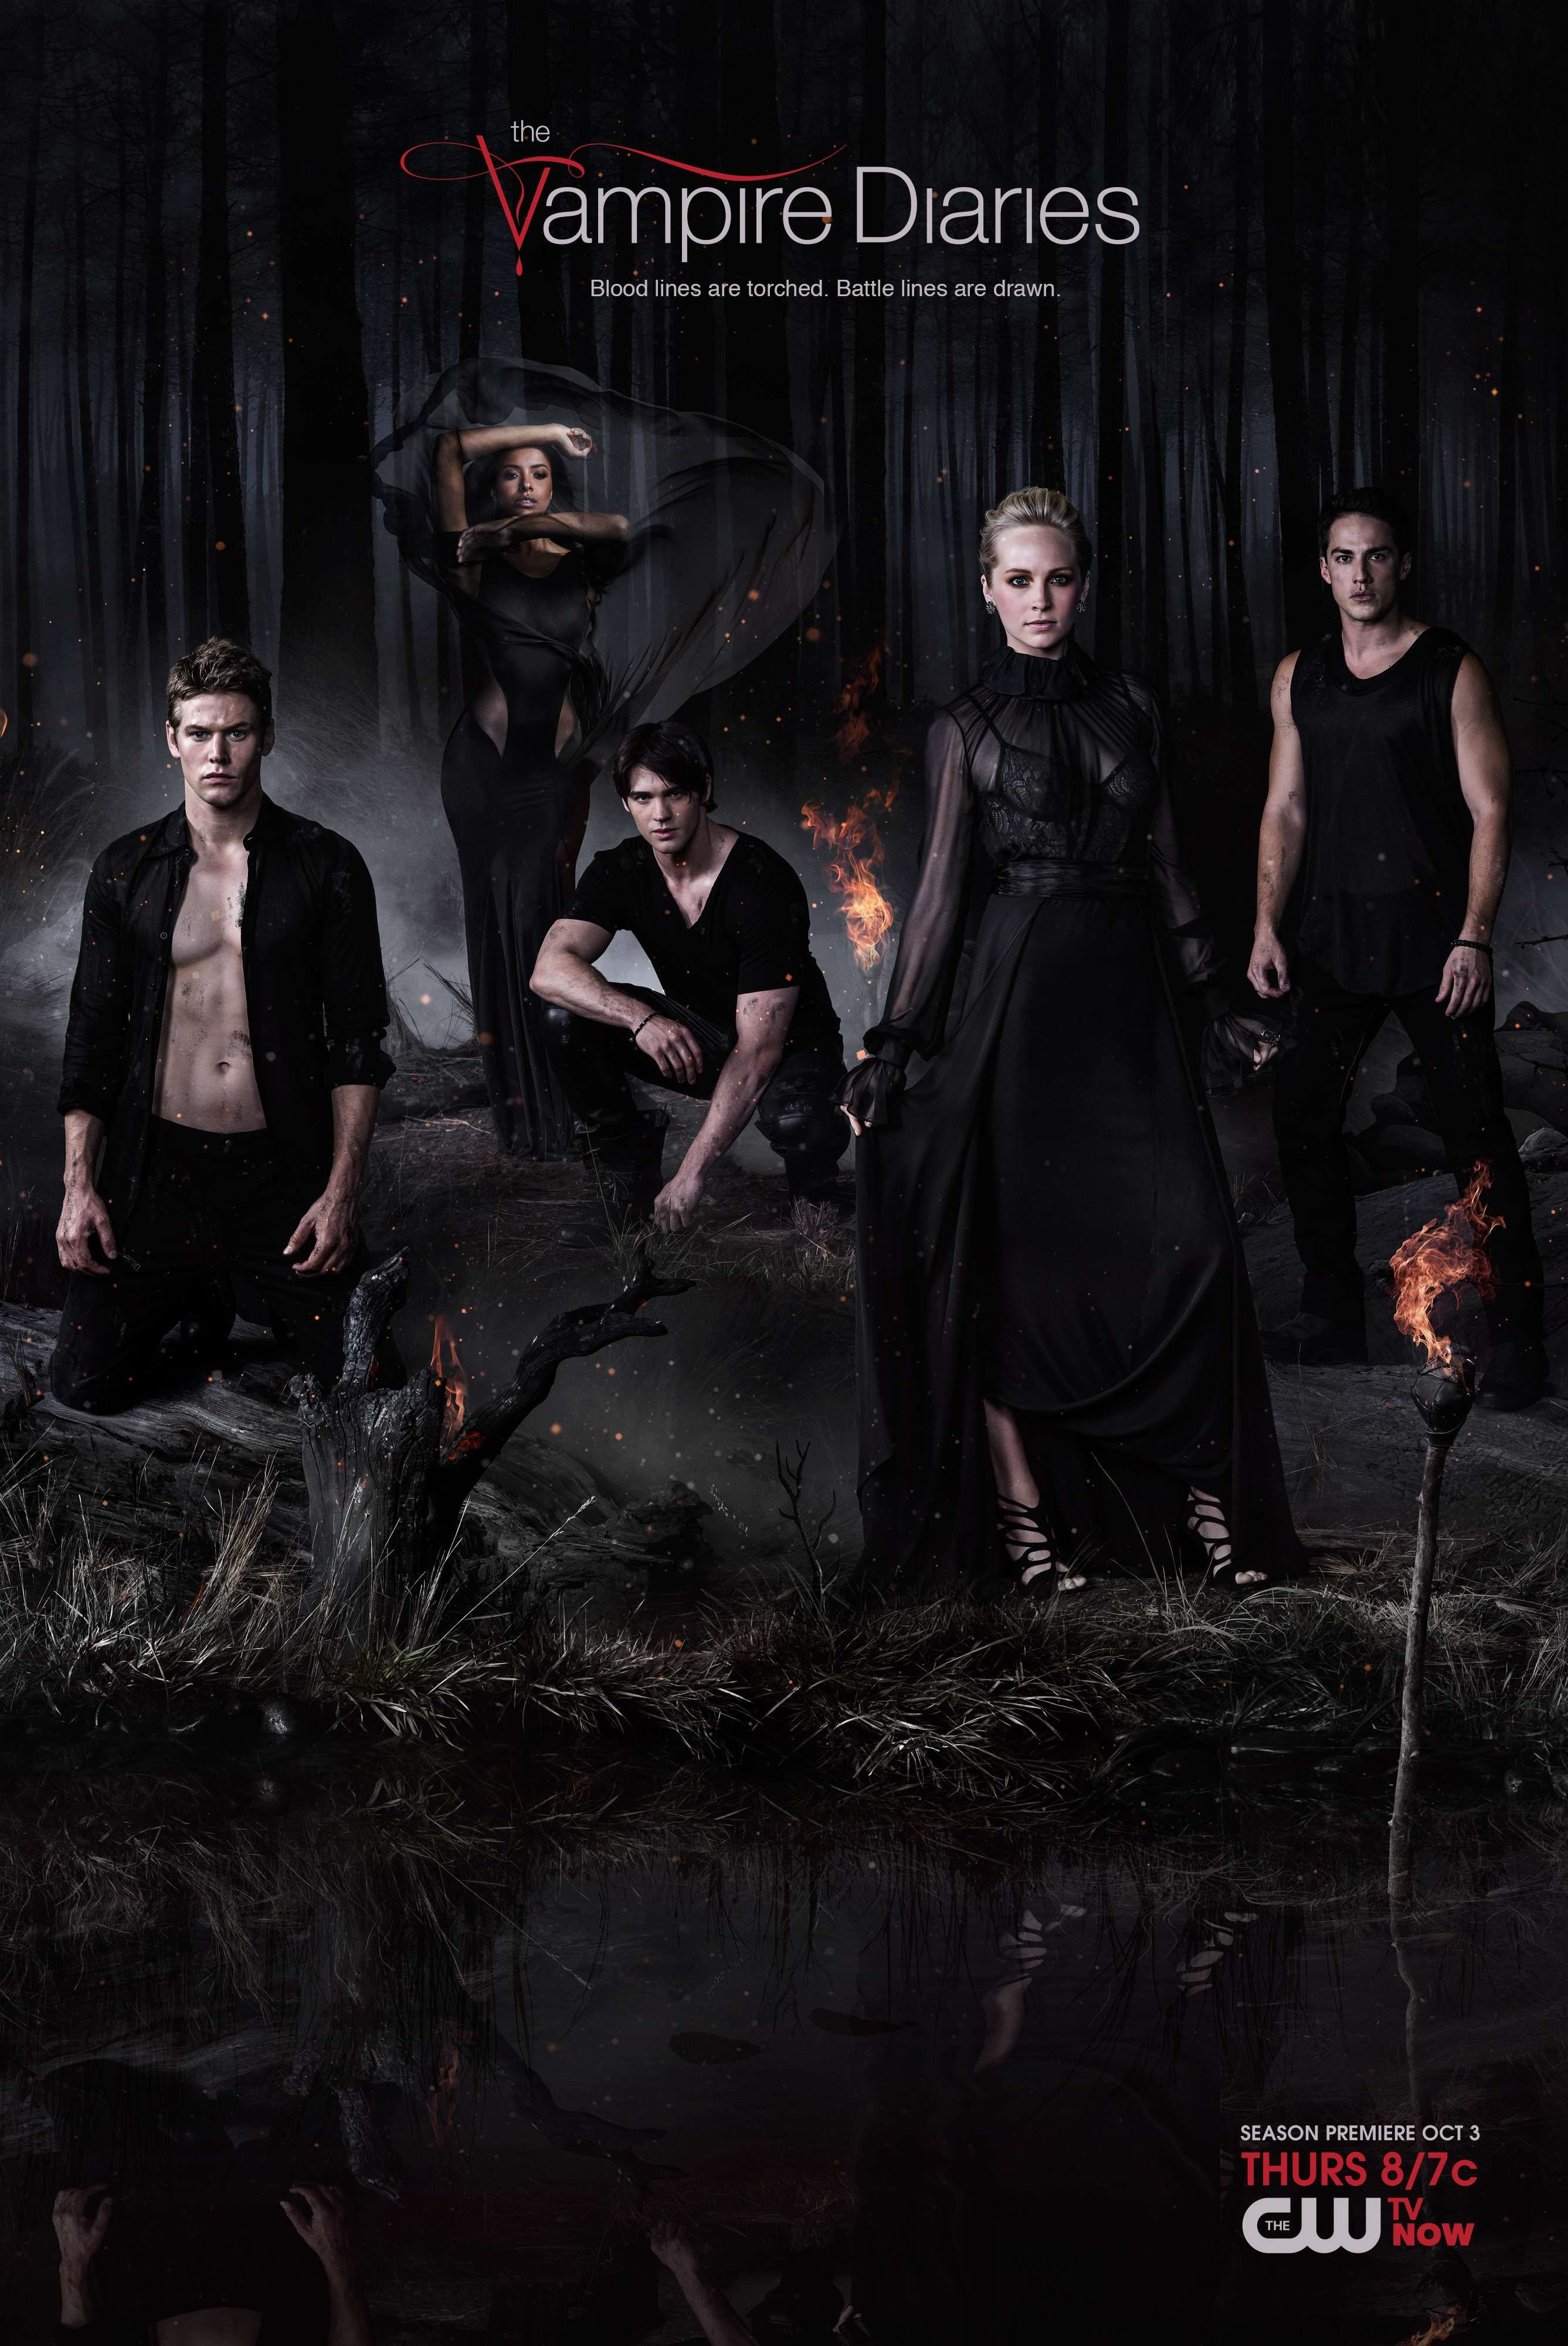 The Vampire Diaries Season 5 Poster Vampire Diaries Season 5 Vampire Diaries Season 7 Vampire Diaries Poster